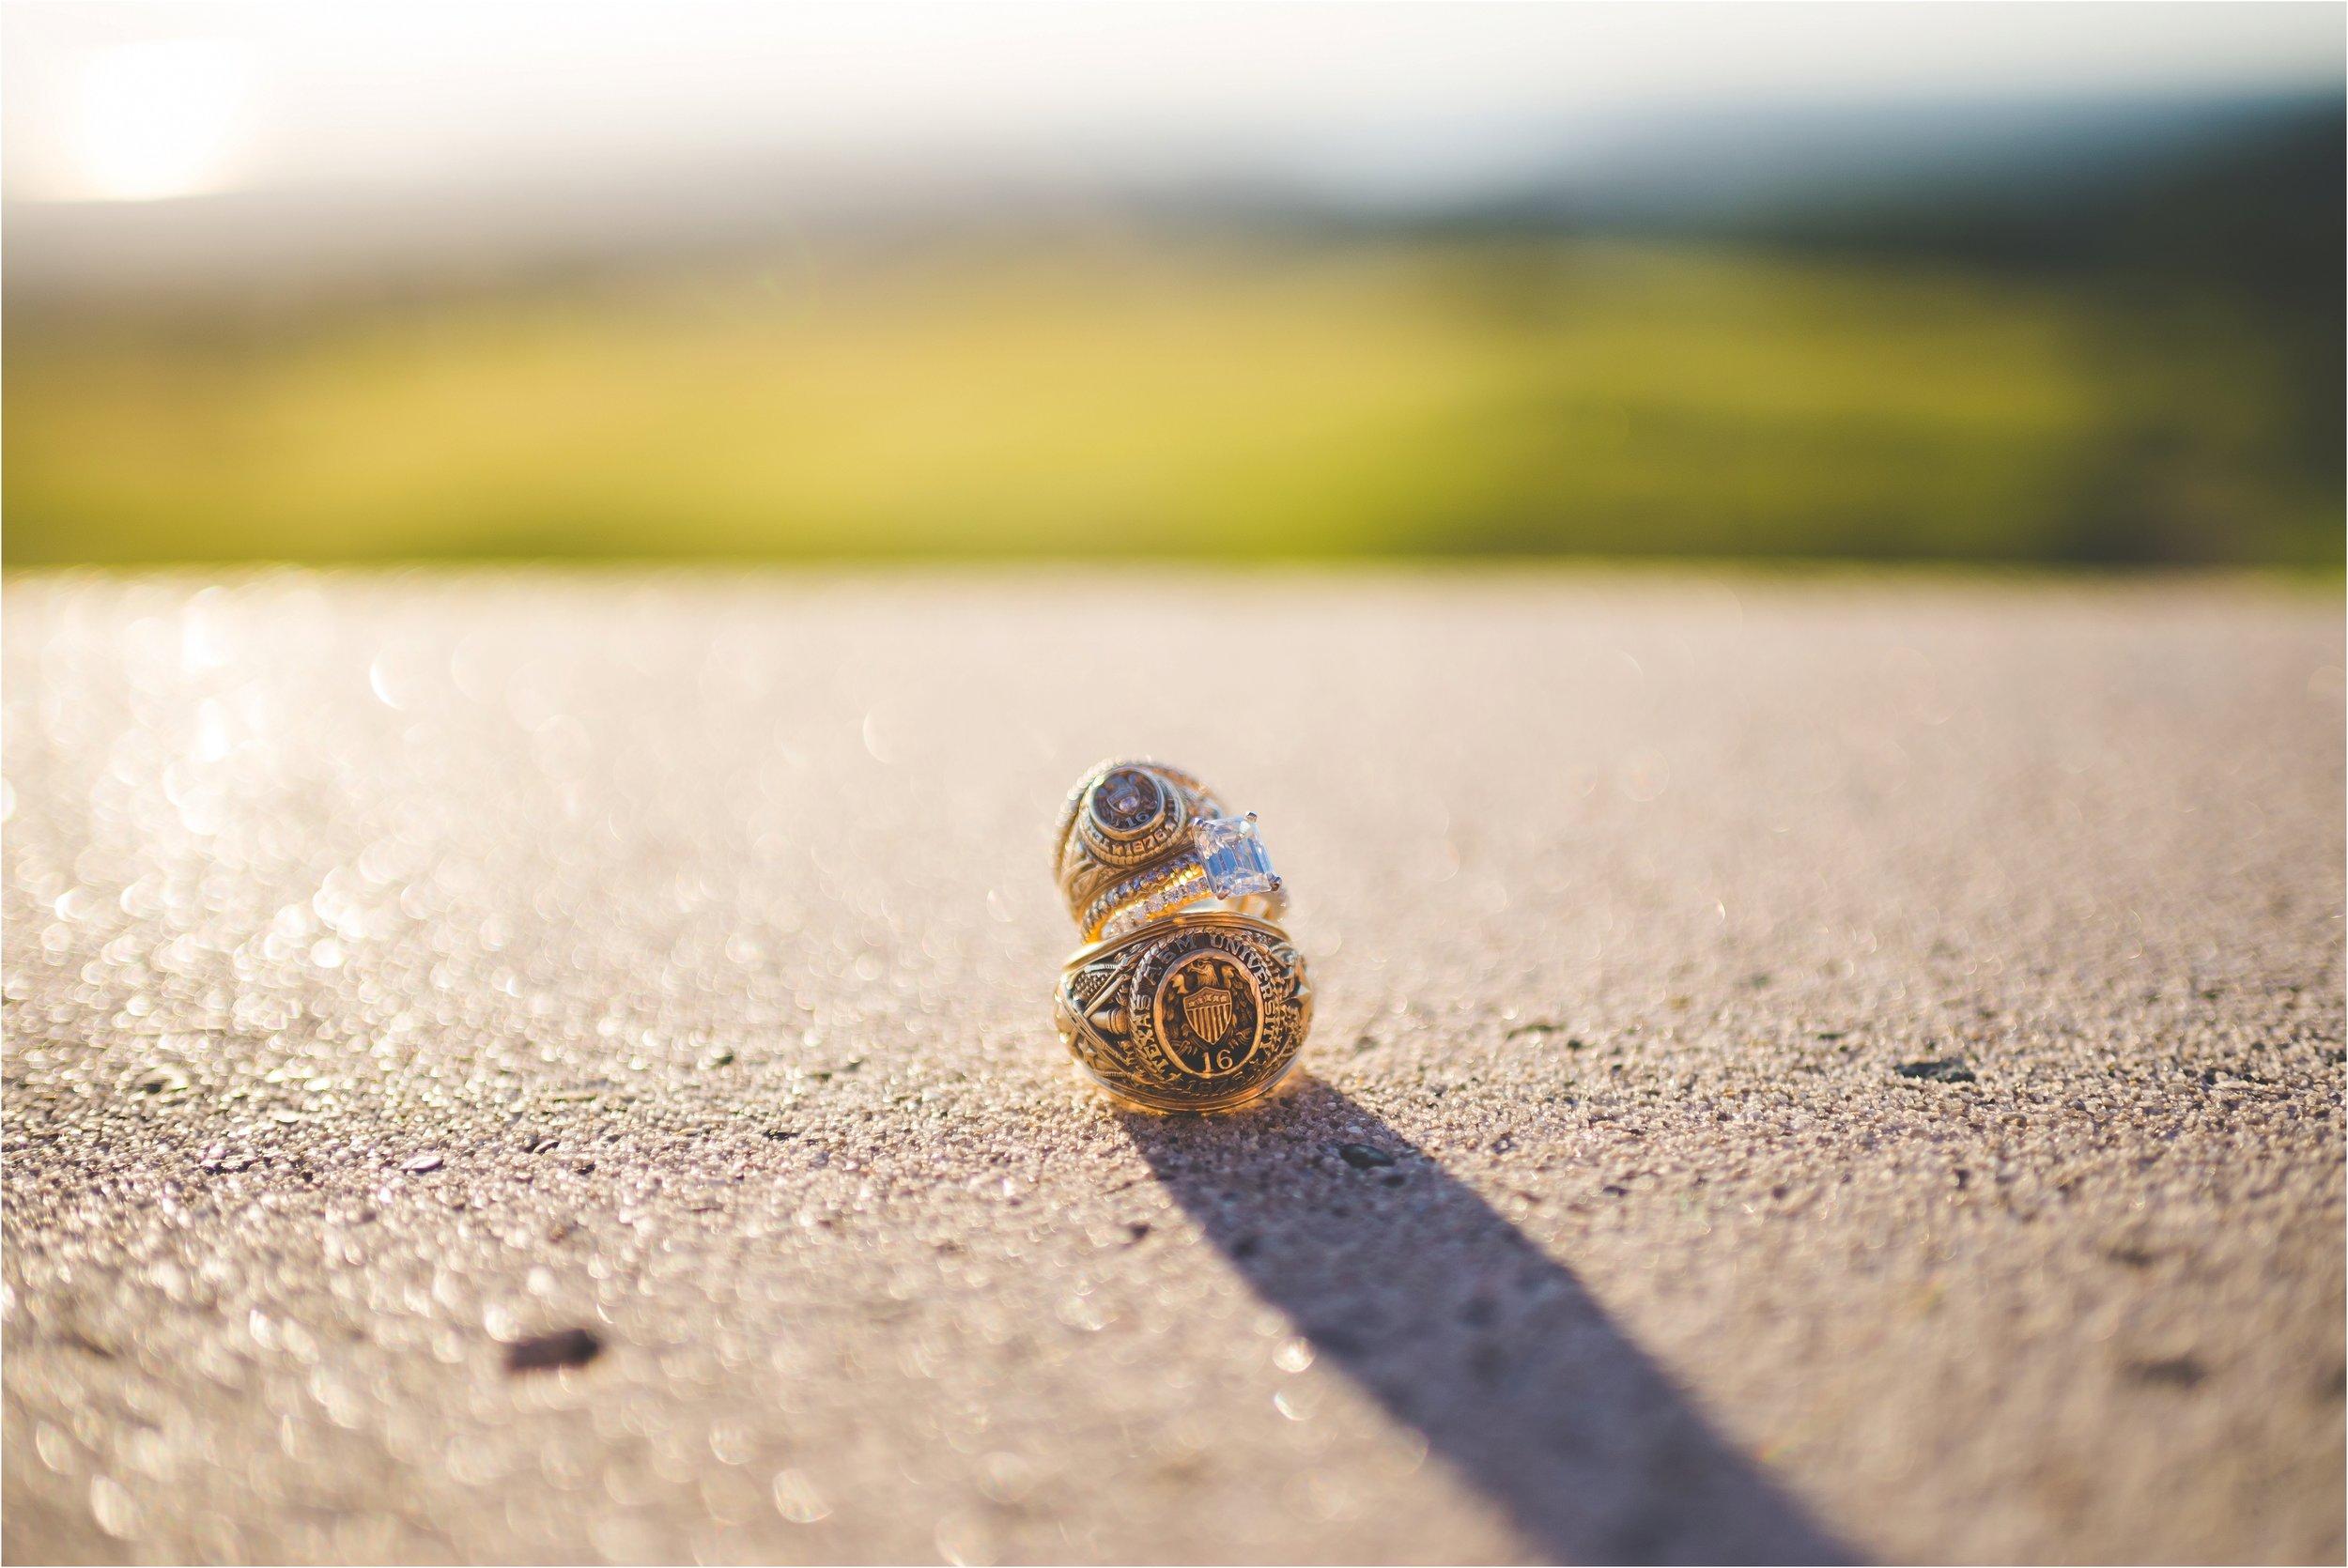 newcastle-golf-club-proposal-jannicka-mayte-seattle-washington-engagement-wedding-photographer_0049.jpg